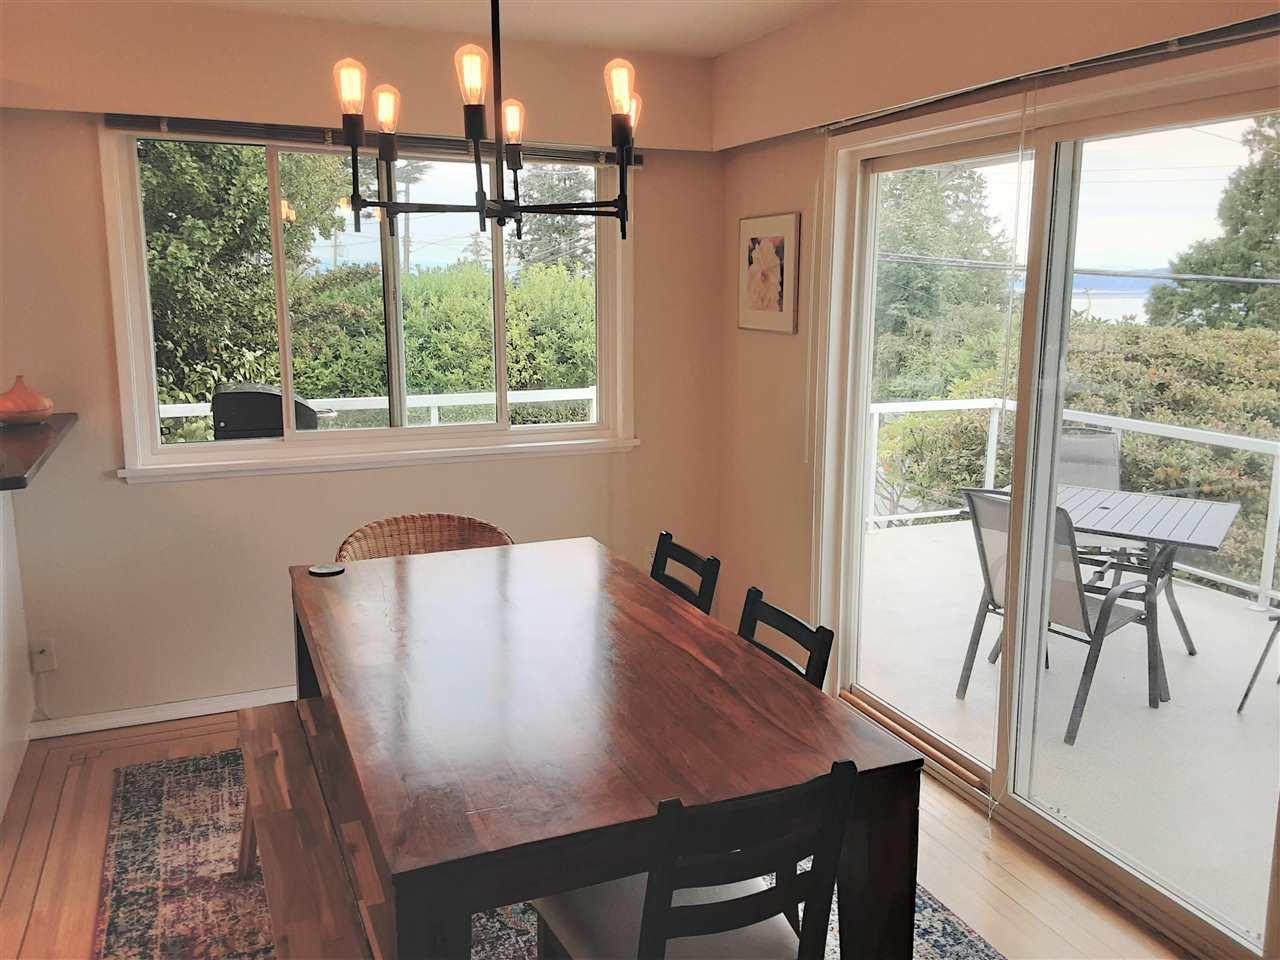 Photo 8: Photos: 15291 COLUMBIA Avenue: White Rock House for sale (South Surrey White Rock)  : MLS®# R2492863